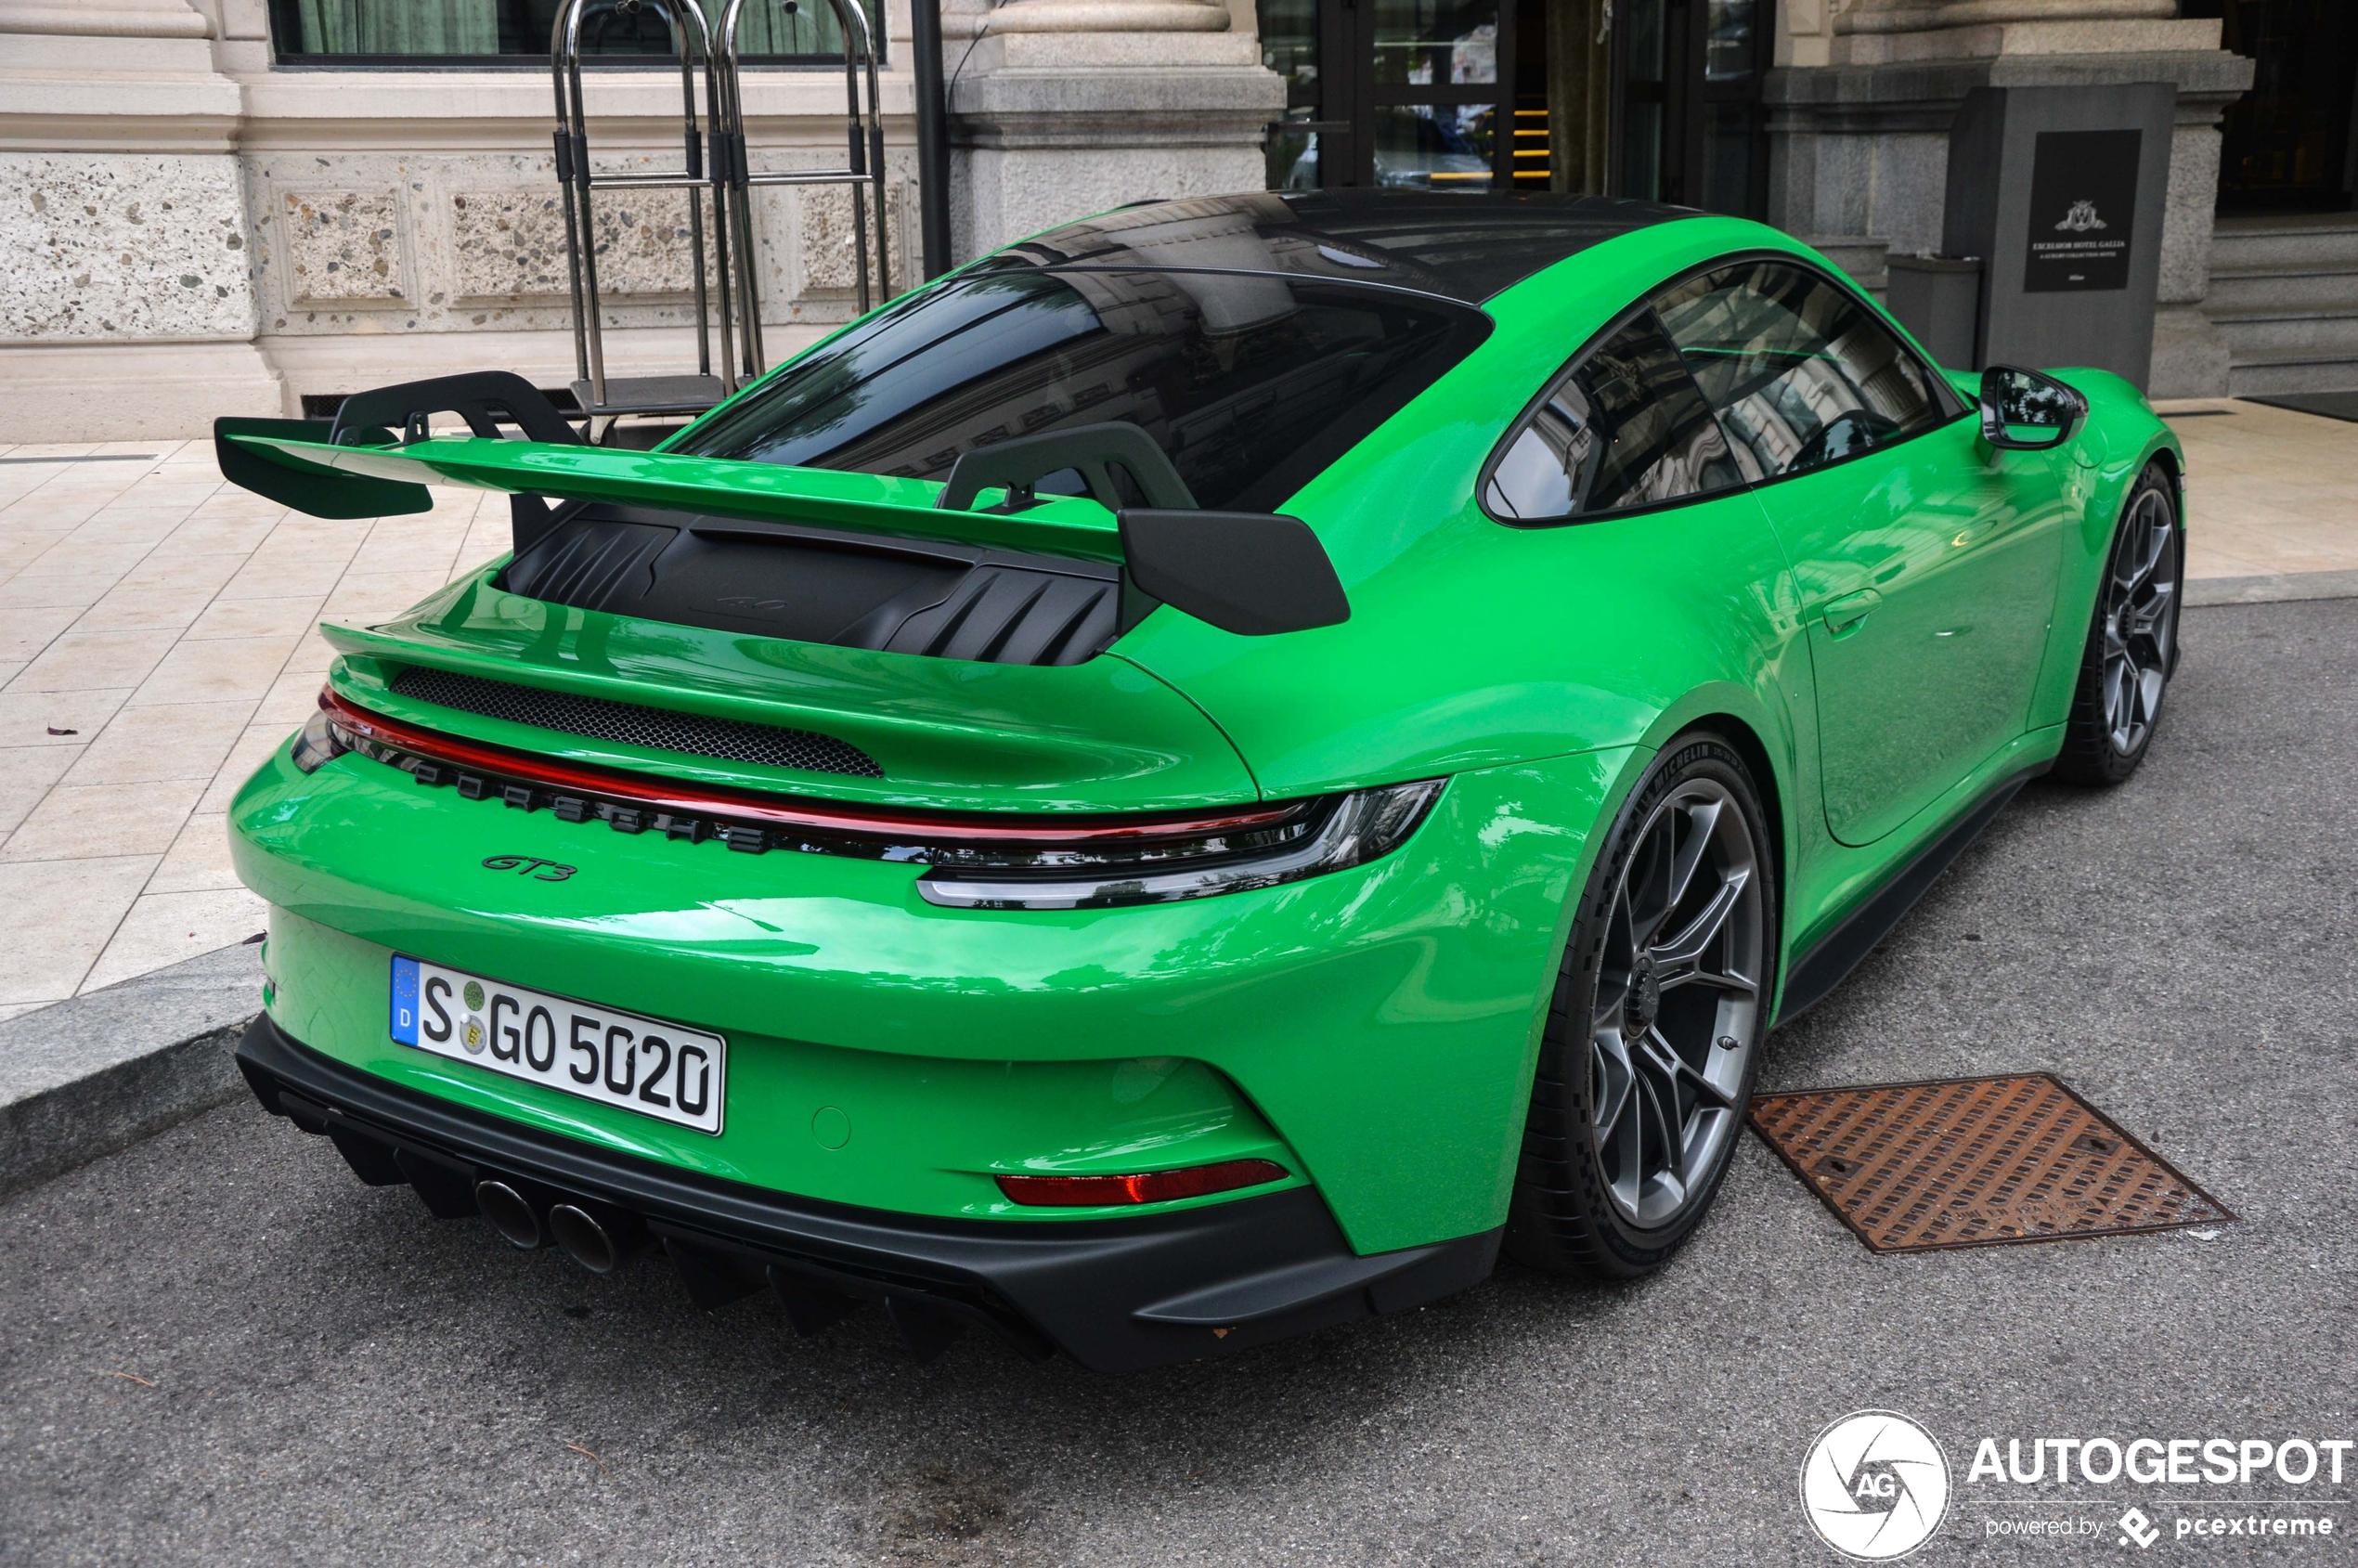 We've never seen the Porsche 992 GT3 in Python green before